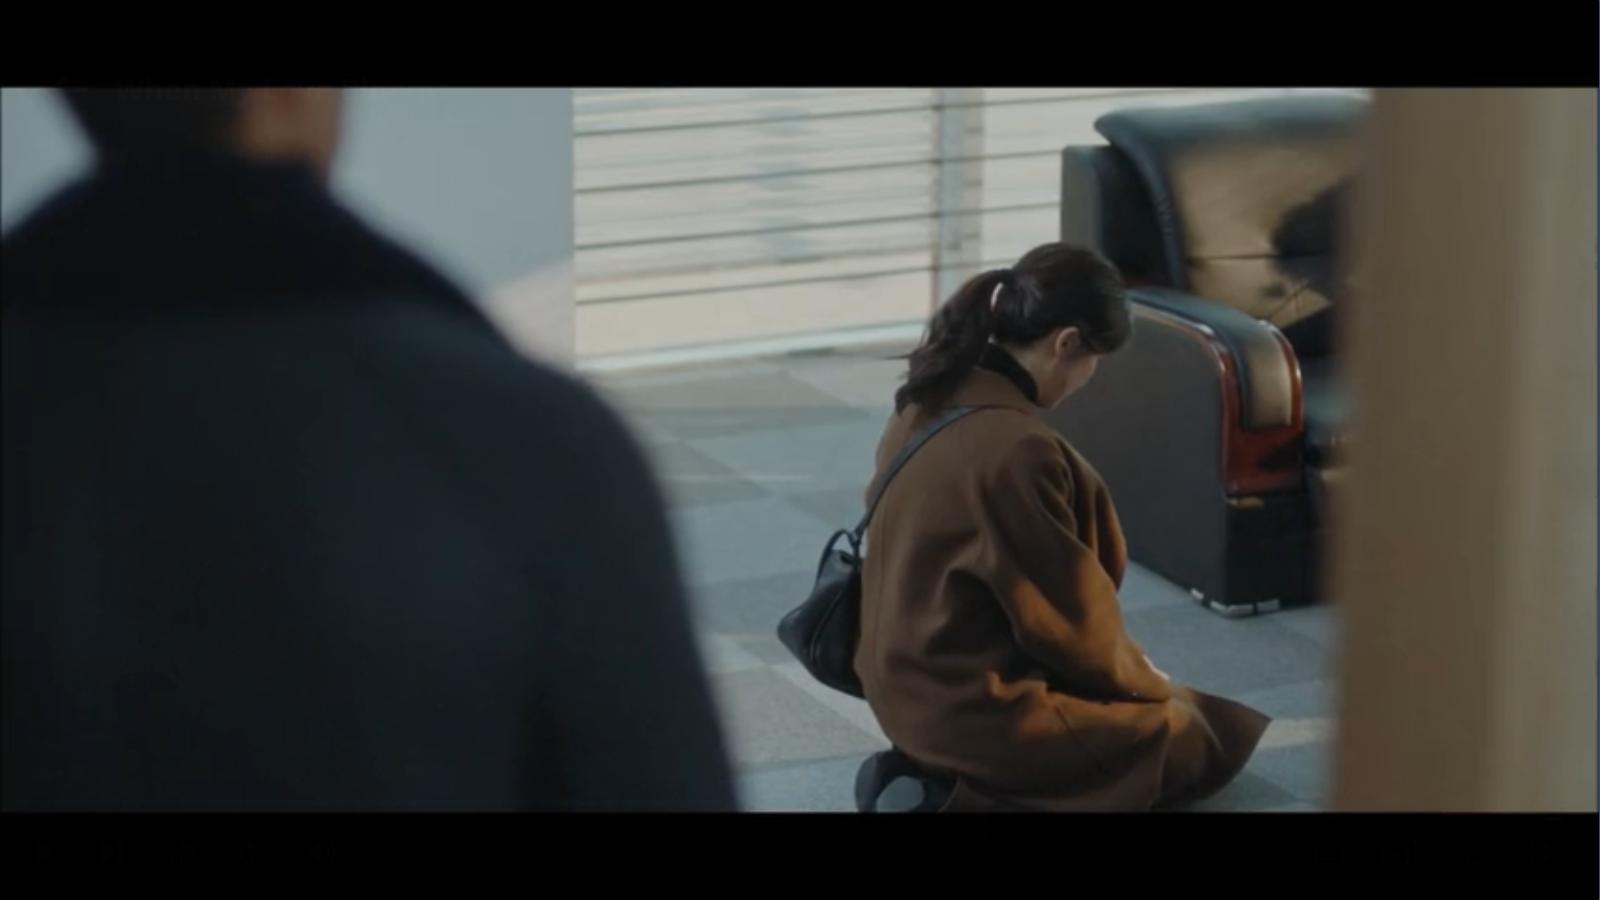 When My Love Blooms Episode 2 Han Jae-hyeon sees Yoon Ji-soo kneeling in front of Seo Kyung